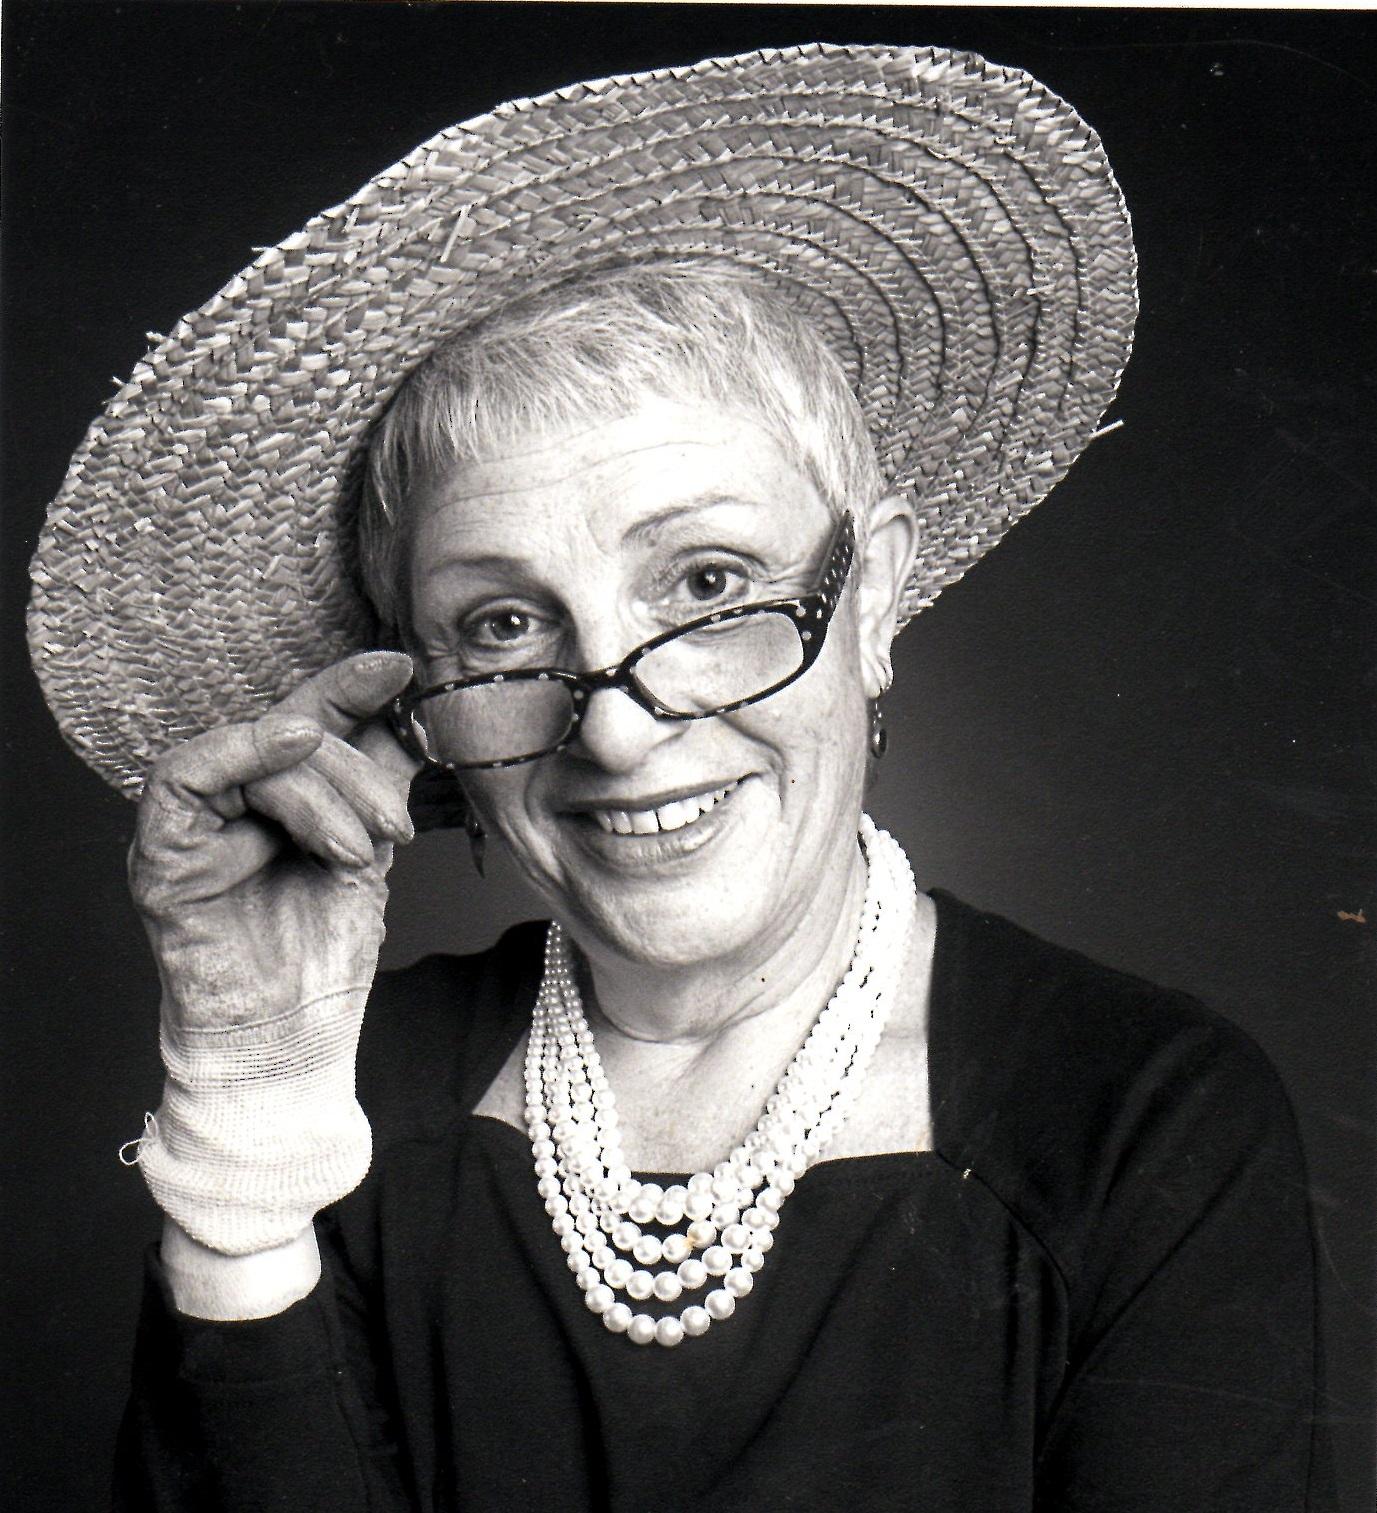 Sarah Vradenburg, Secretary; Former Akron Beacon Journal Editorial Writer and Current Master Gardener Volunteer -